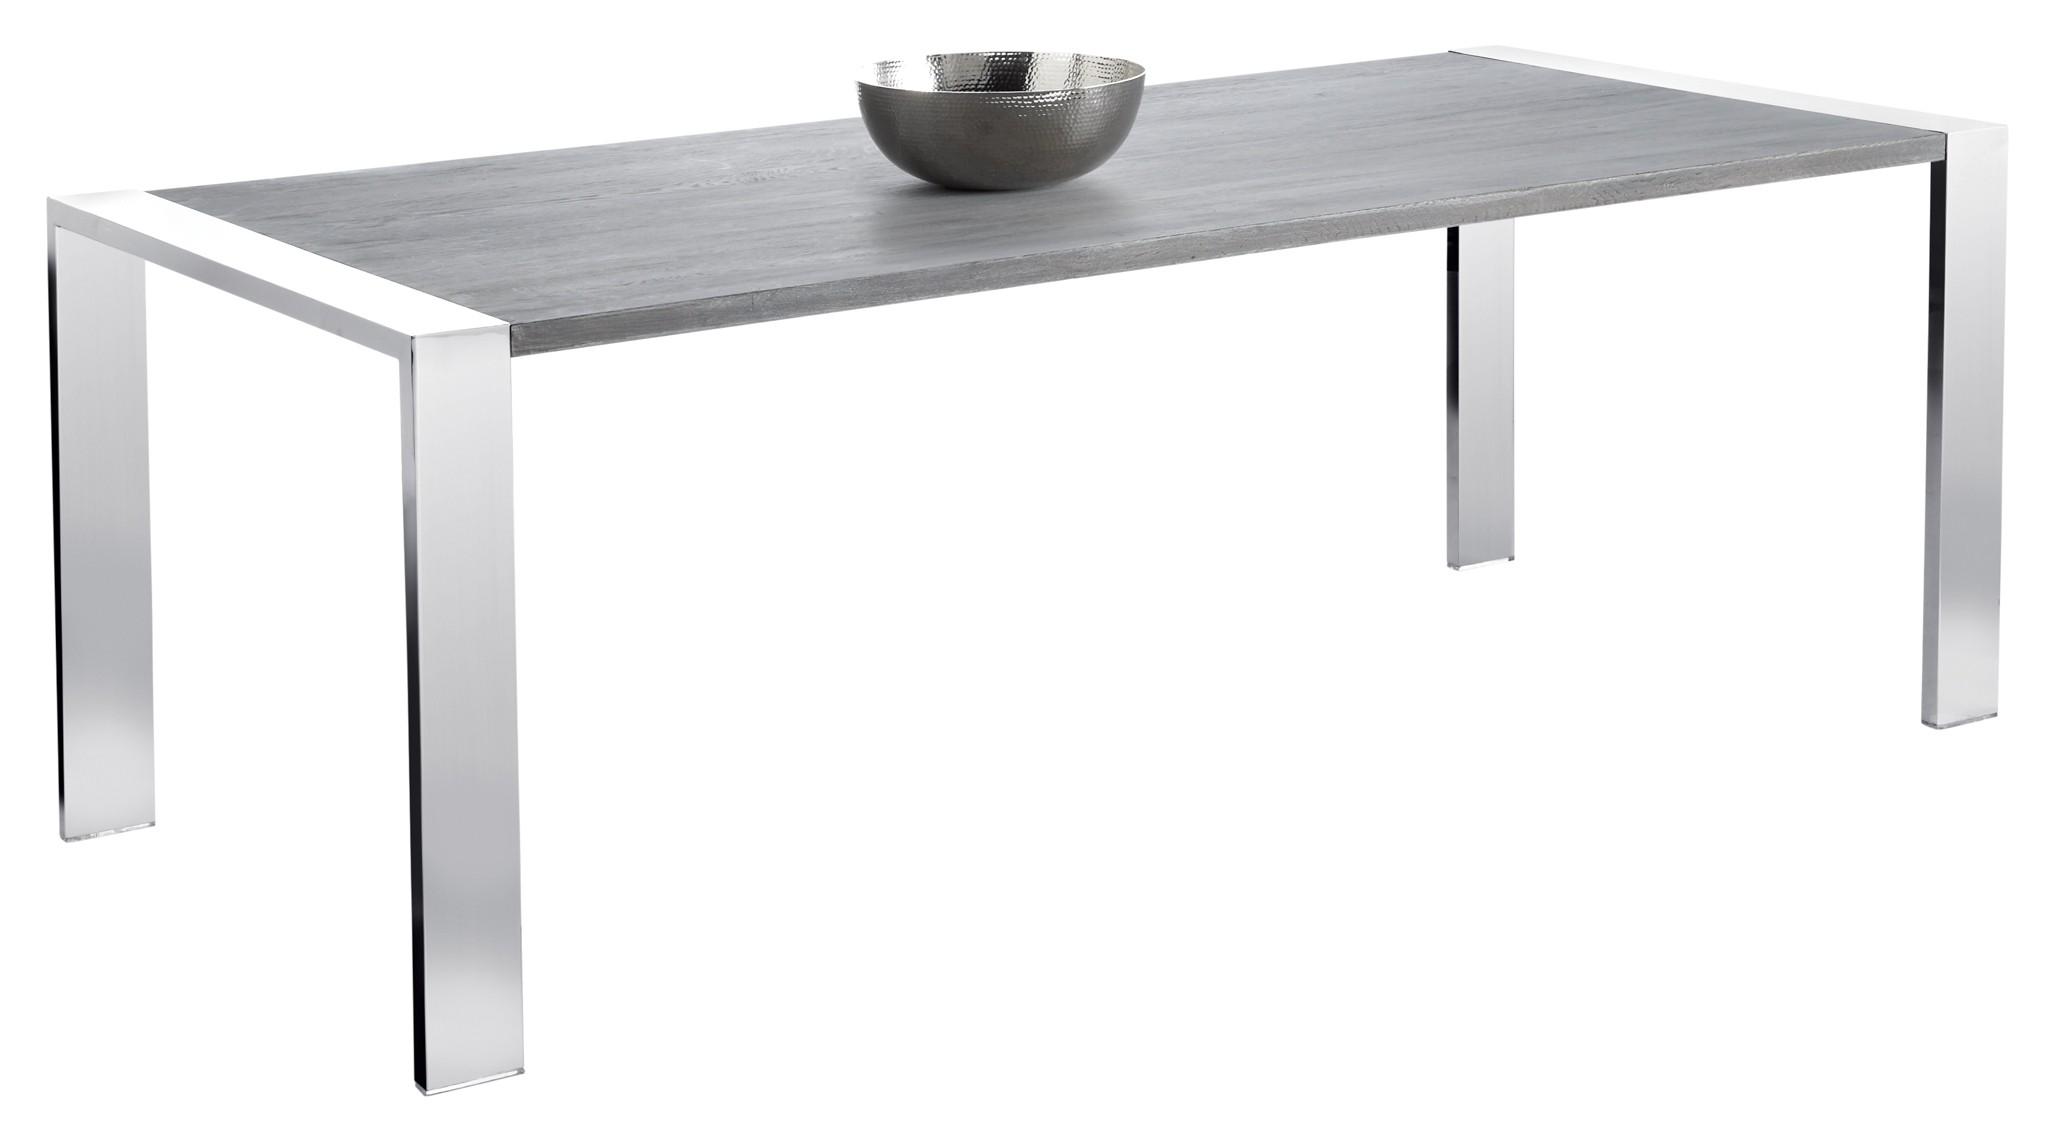 Dalton Dining Table From Sunpan 10273 Coleman Furniture